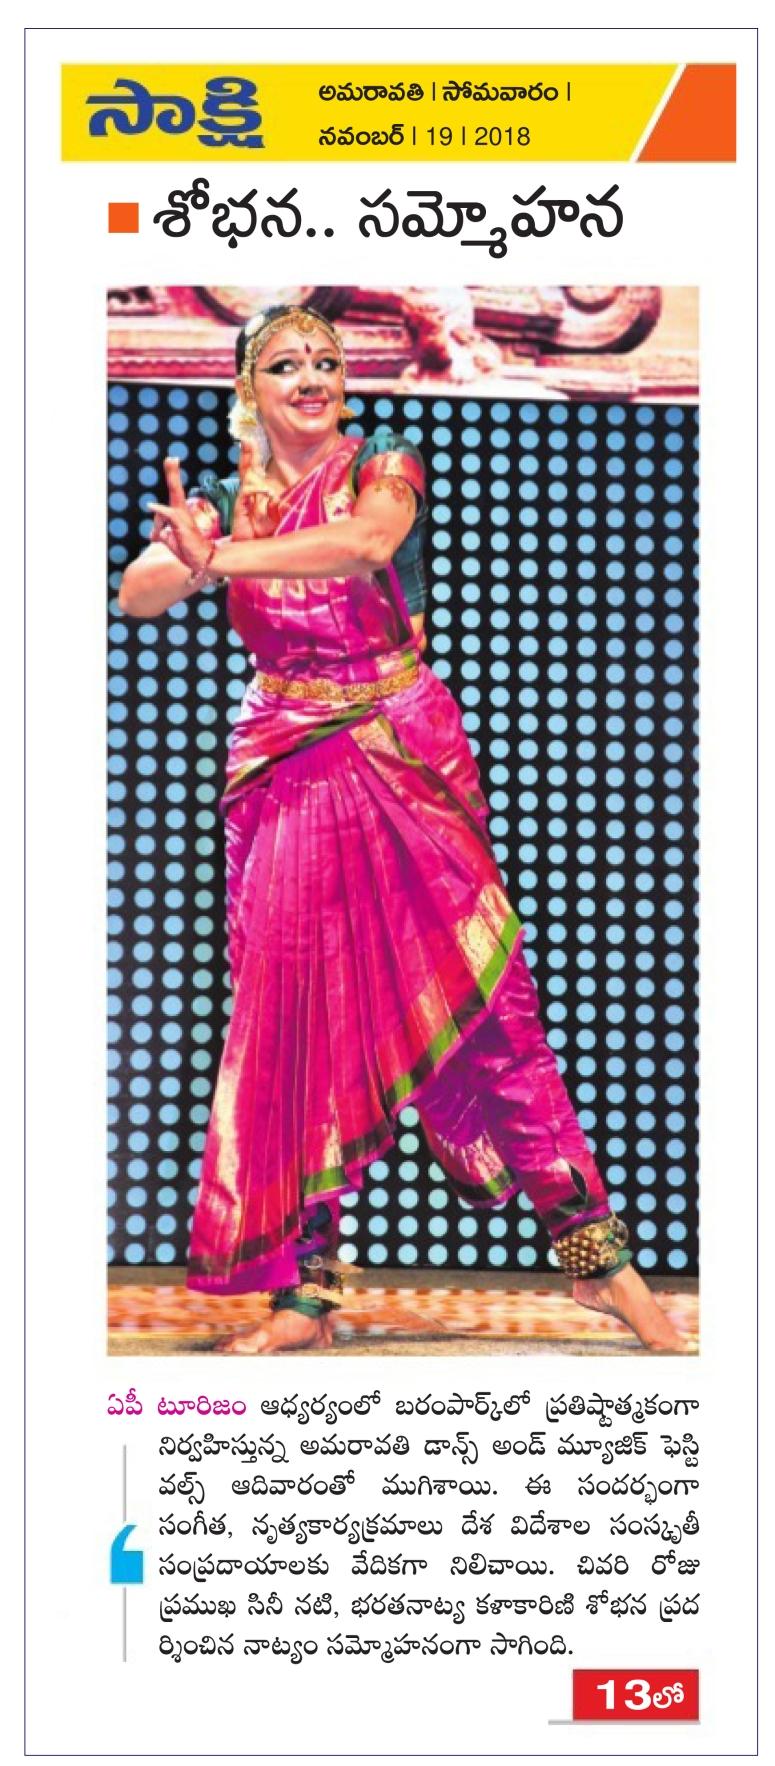 Amaravati Dance Festival News Clip Sakshi VJA 19-11-2018